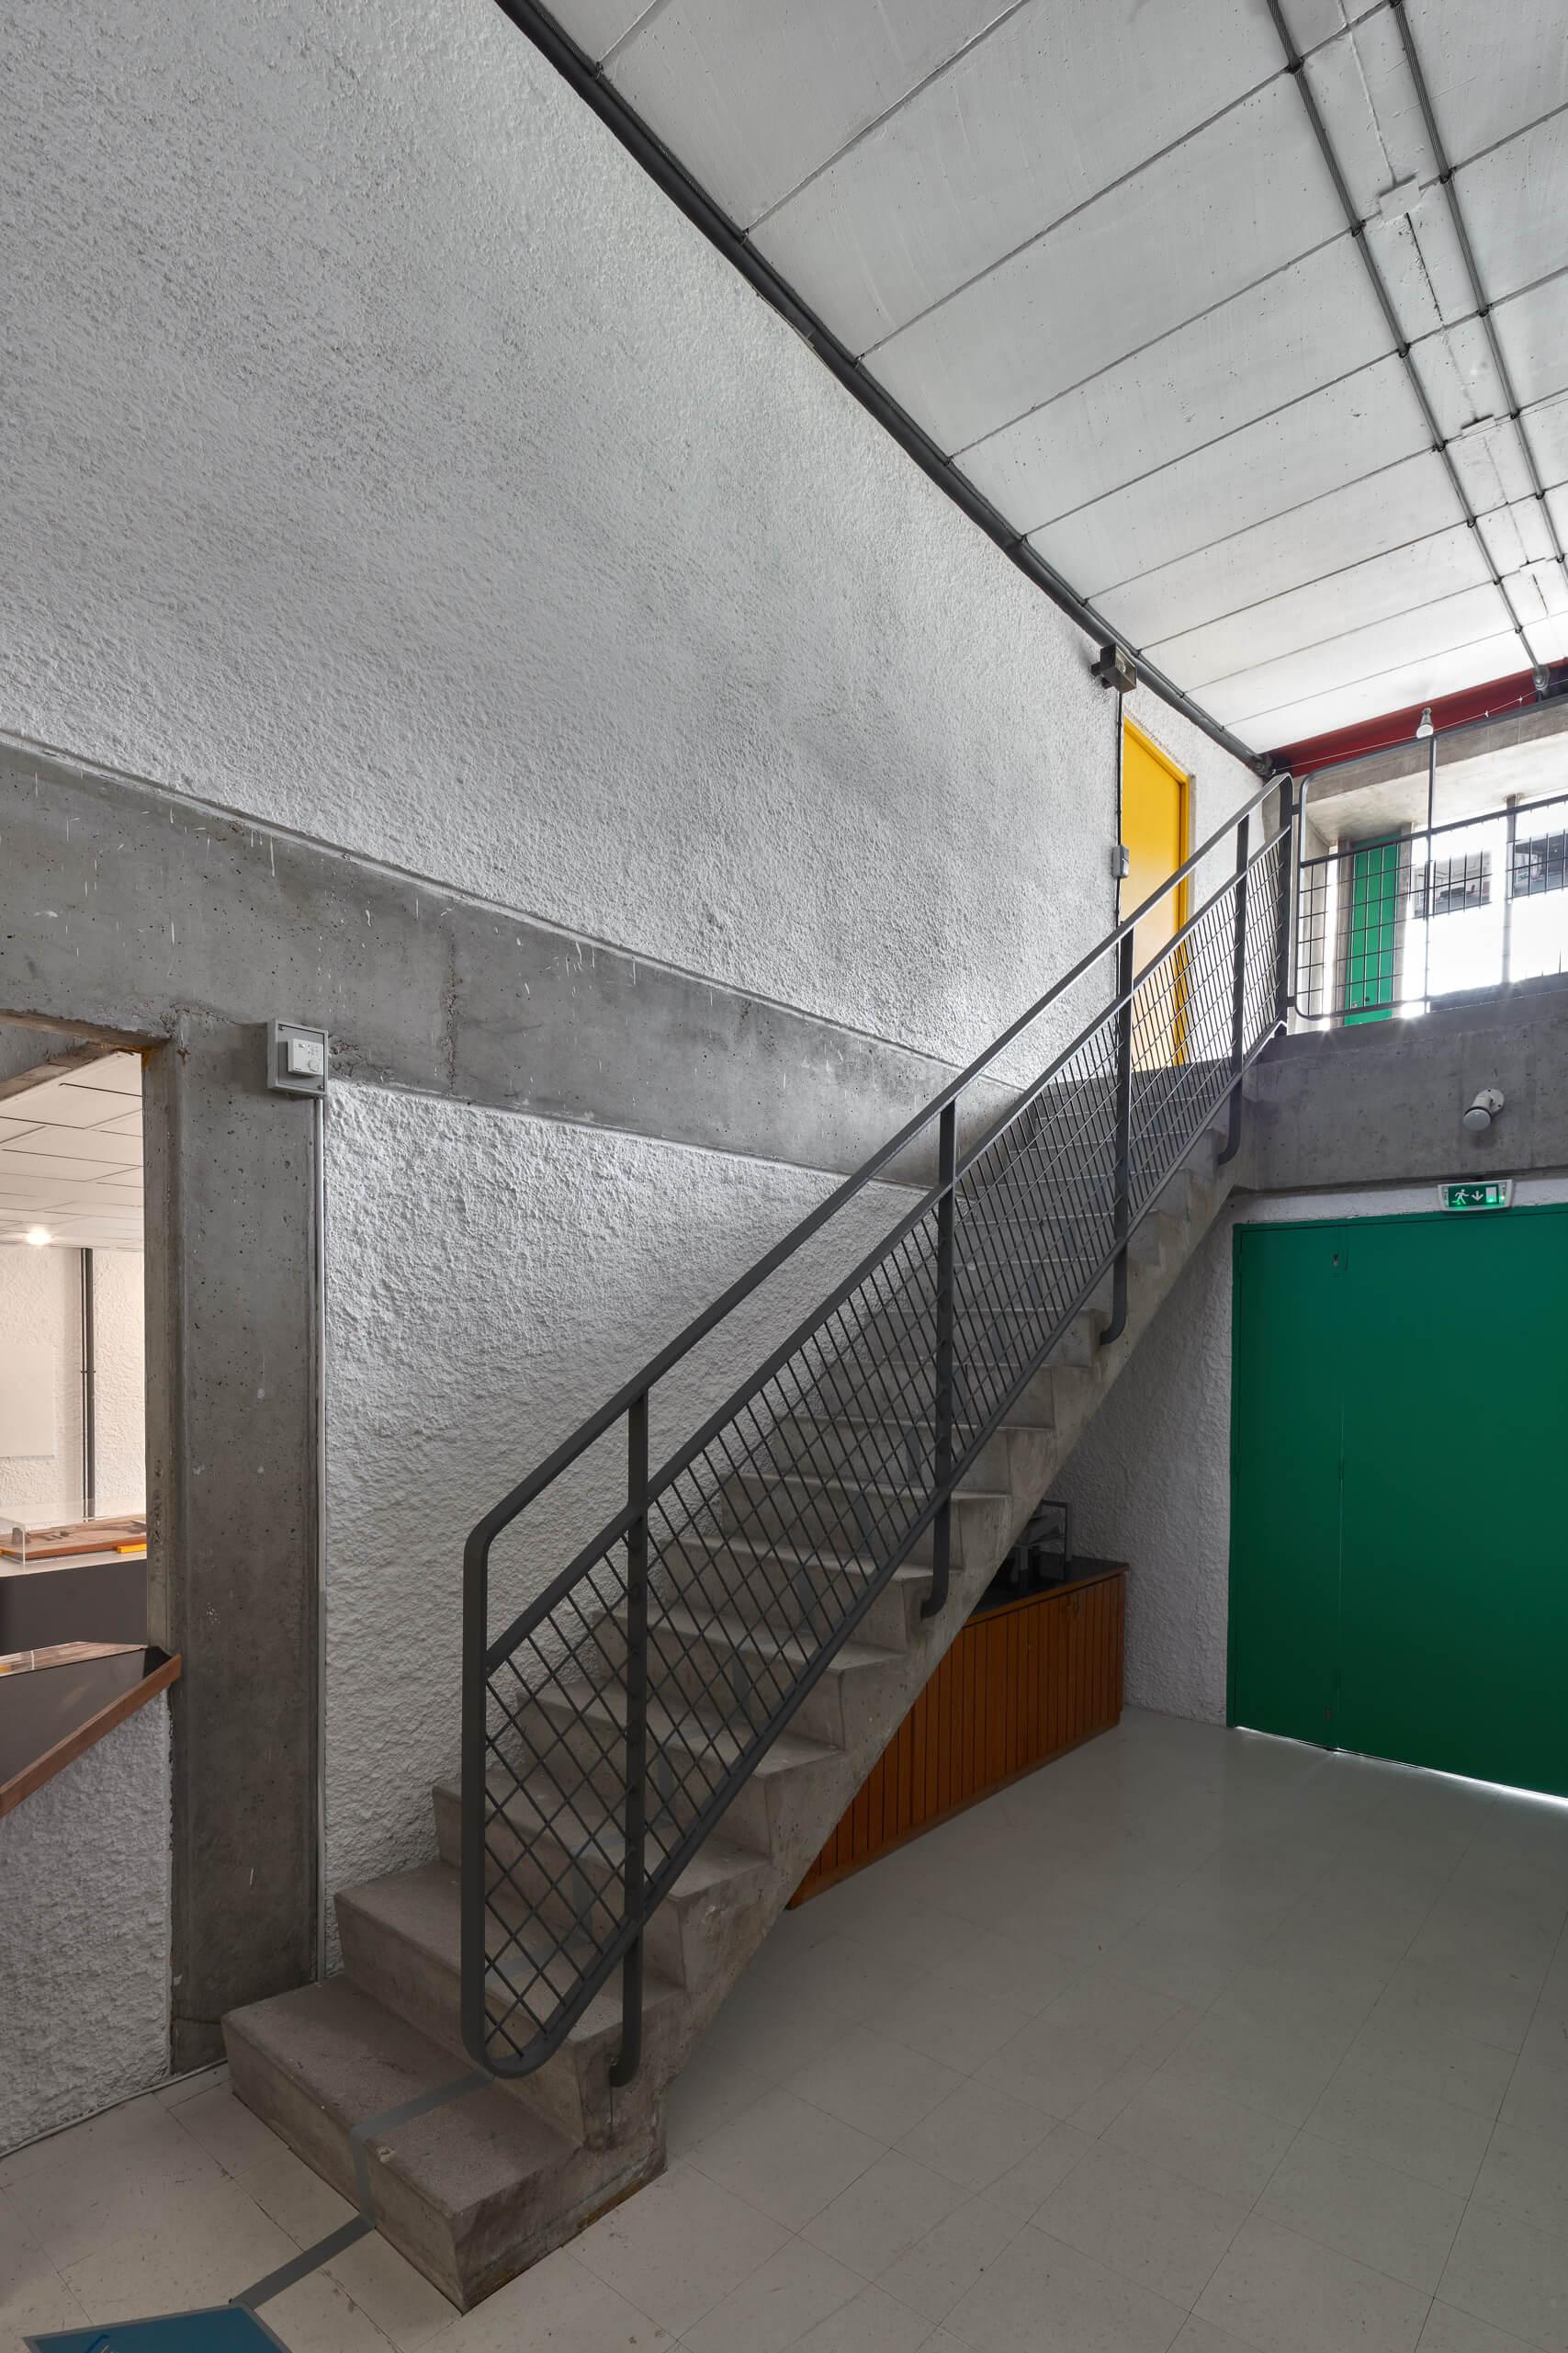 Federico_Covre_Le_Corbusier_Stadium_Firminy_2018_13